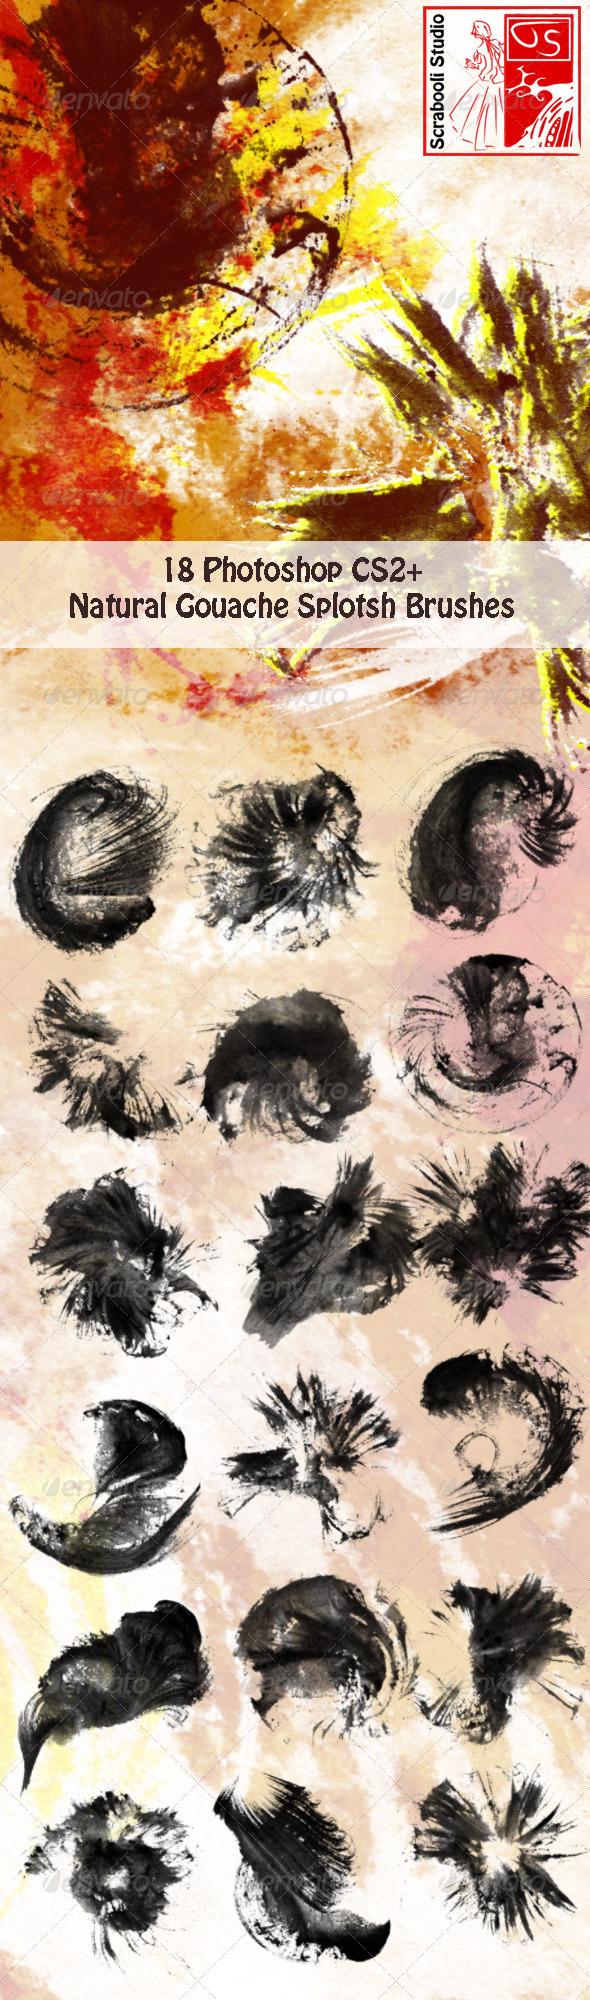 GraphicRiver 18 Gouache Splotch Brushes 4980319